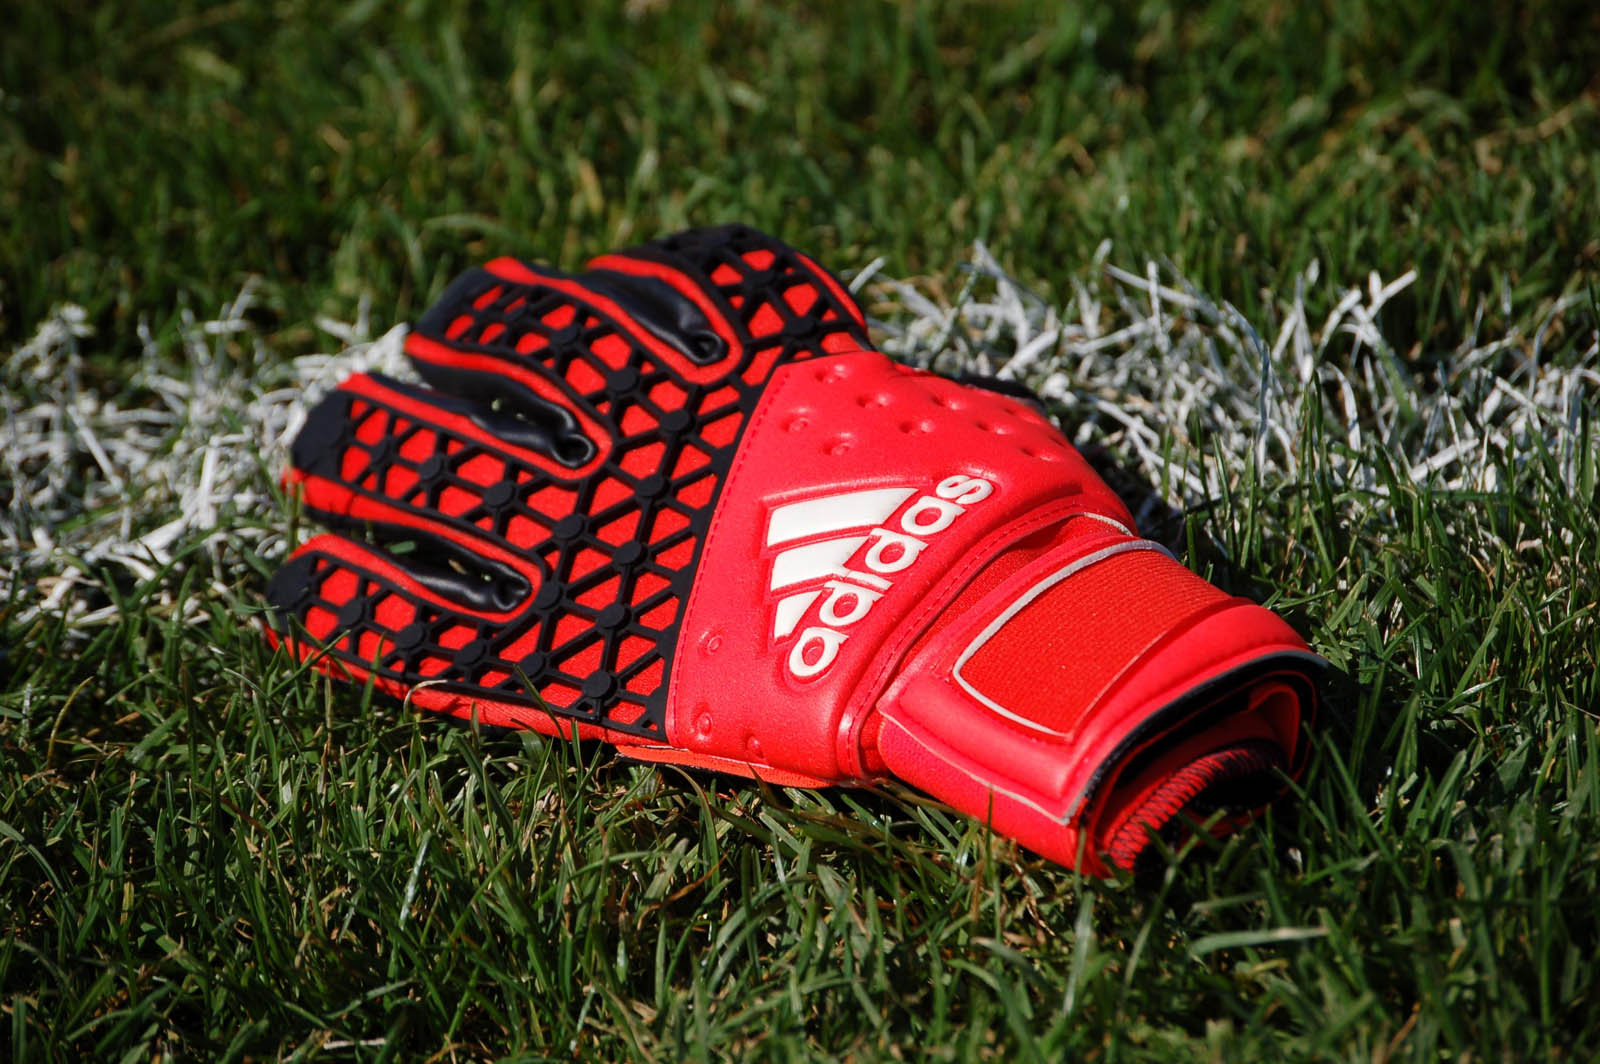 Adidas Adults Predator Zones Fingertip Goalkeeper Gloves ... |Goalkeeper Gloves Adidas 2015